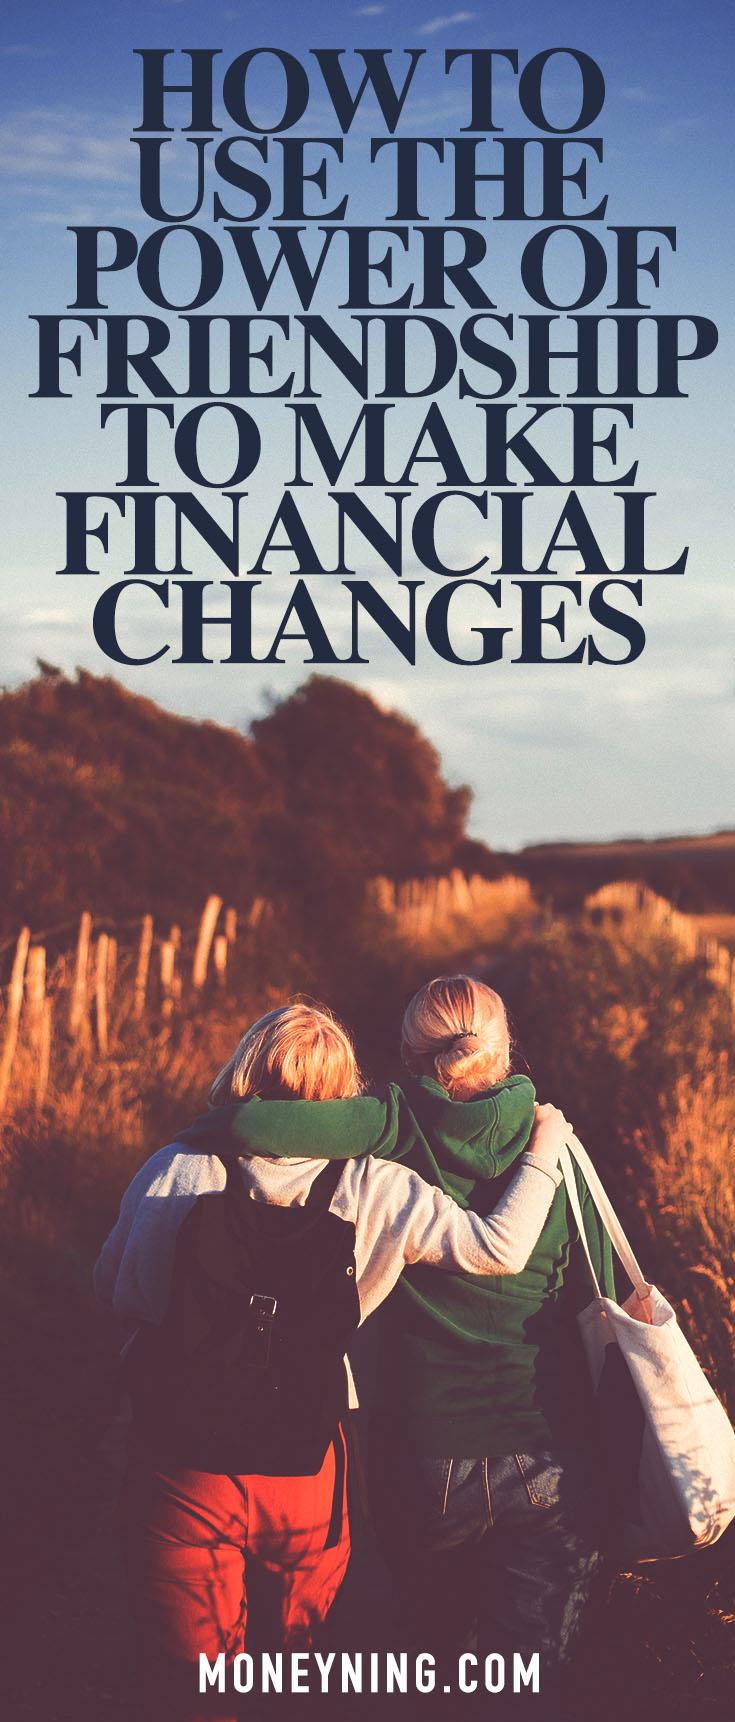 friendship and finances